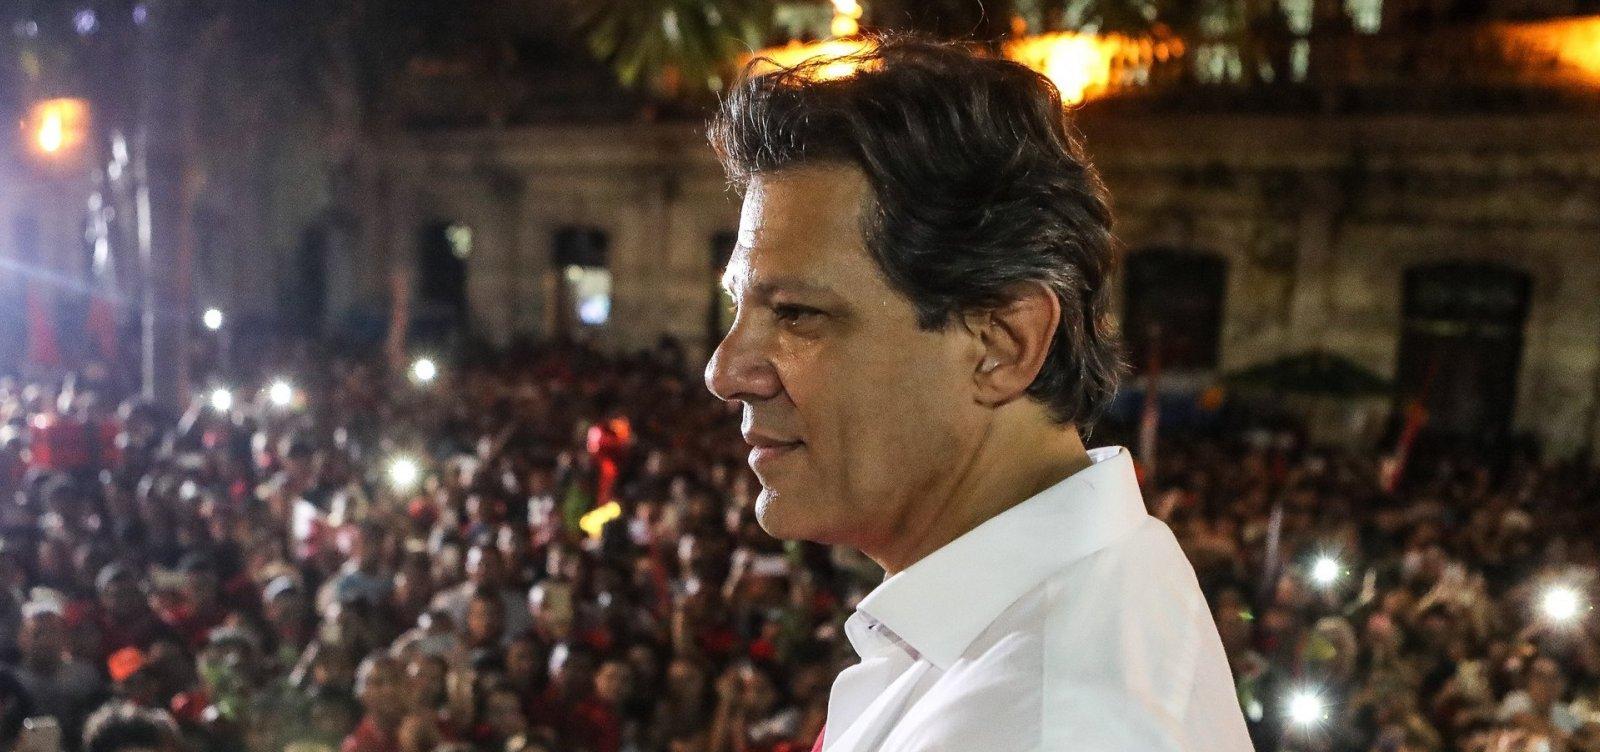 [Haddad vai intensificar visitas ao interior de São Paulo para melhorar desempenho]